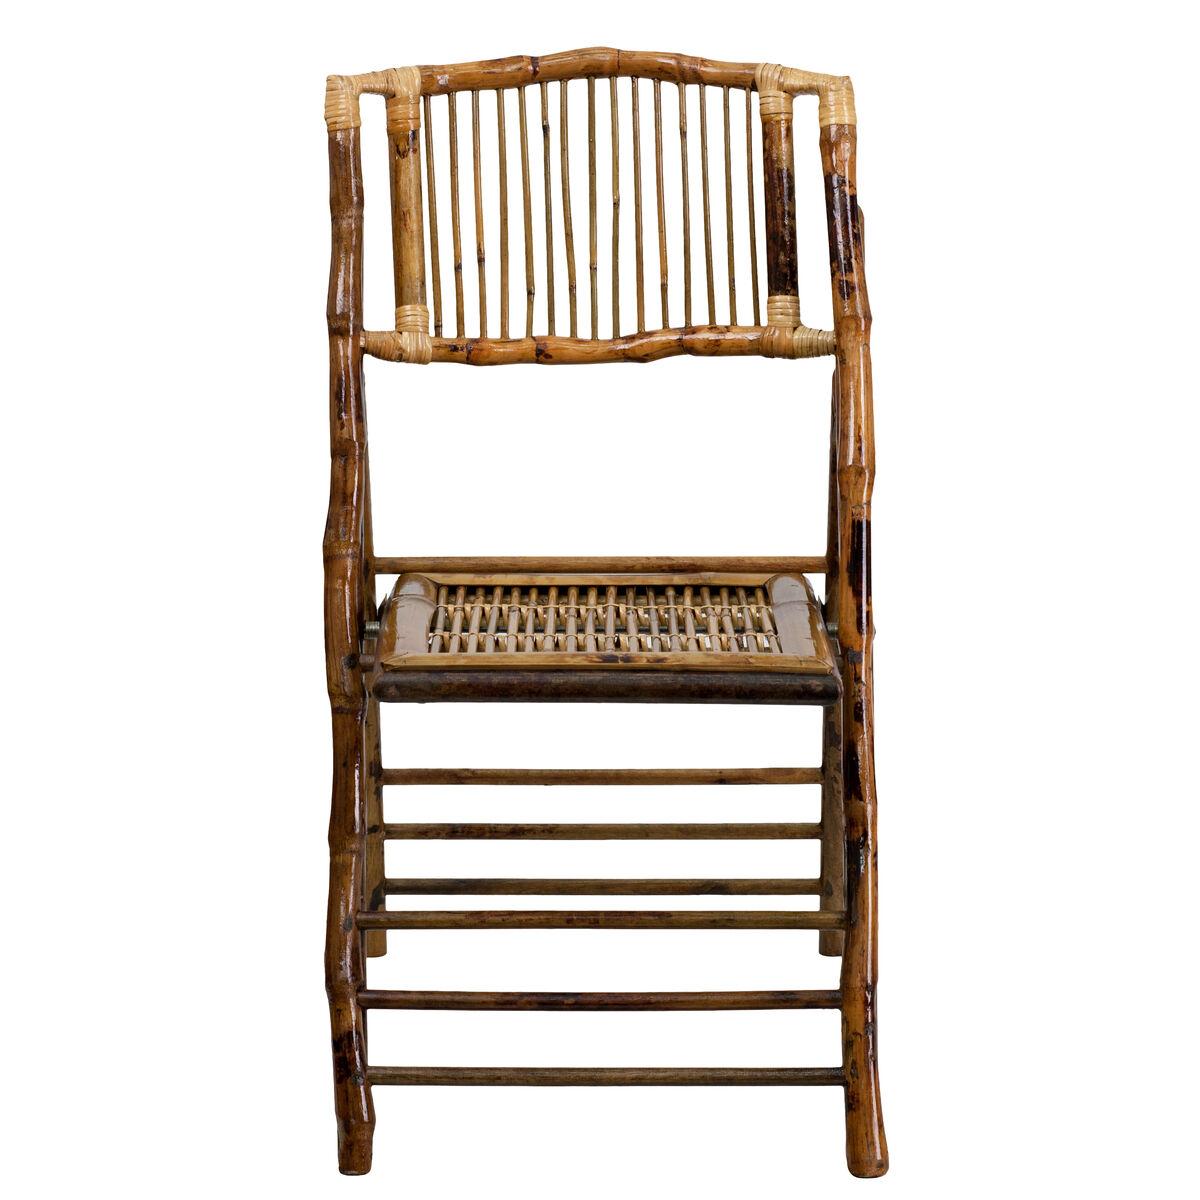 Bamboo Folding Chair X 62111 Bam Gg Foldingchairs4less Com